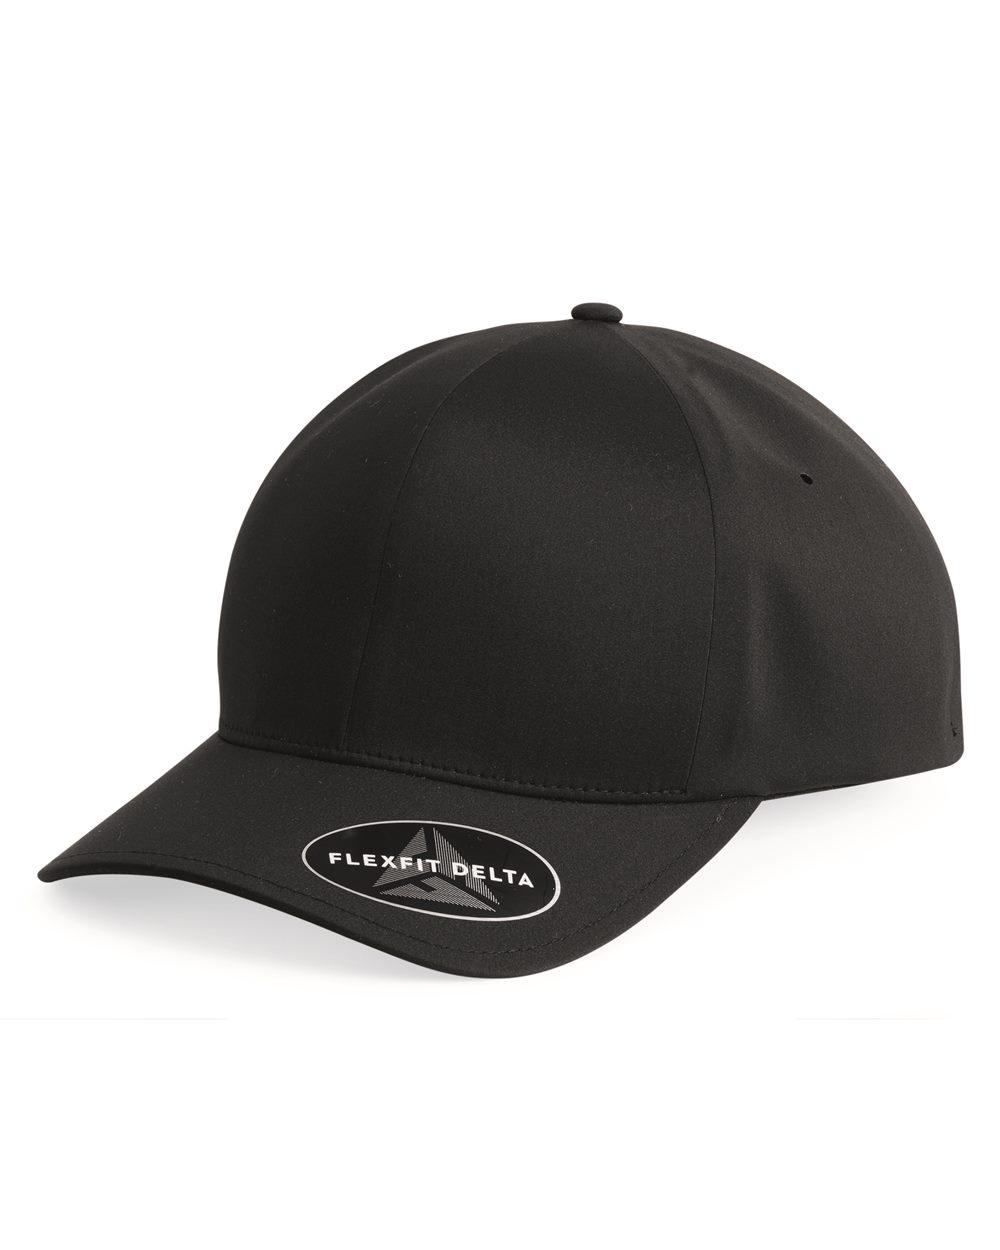 Flexfit 180 - Delta Seamless Cap